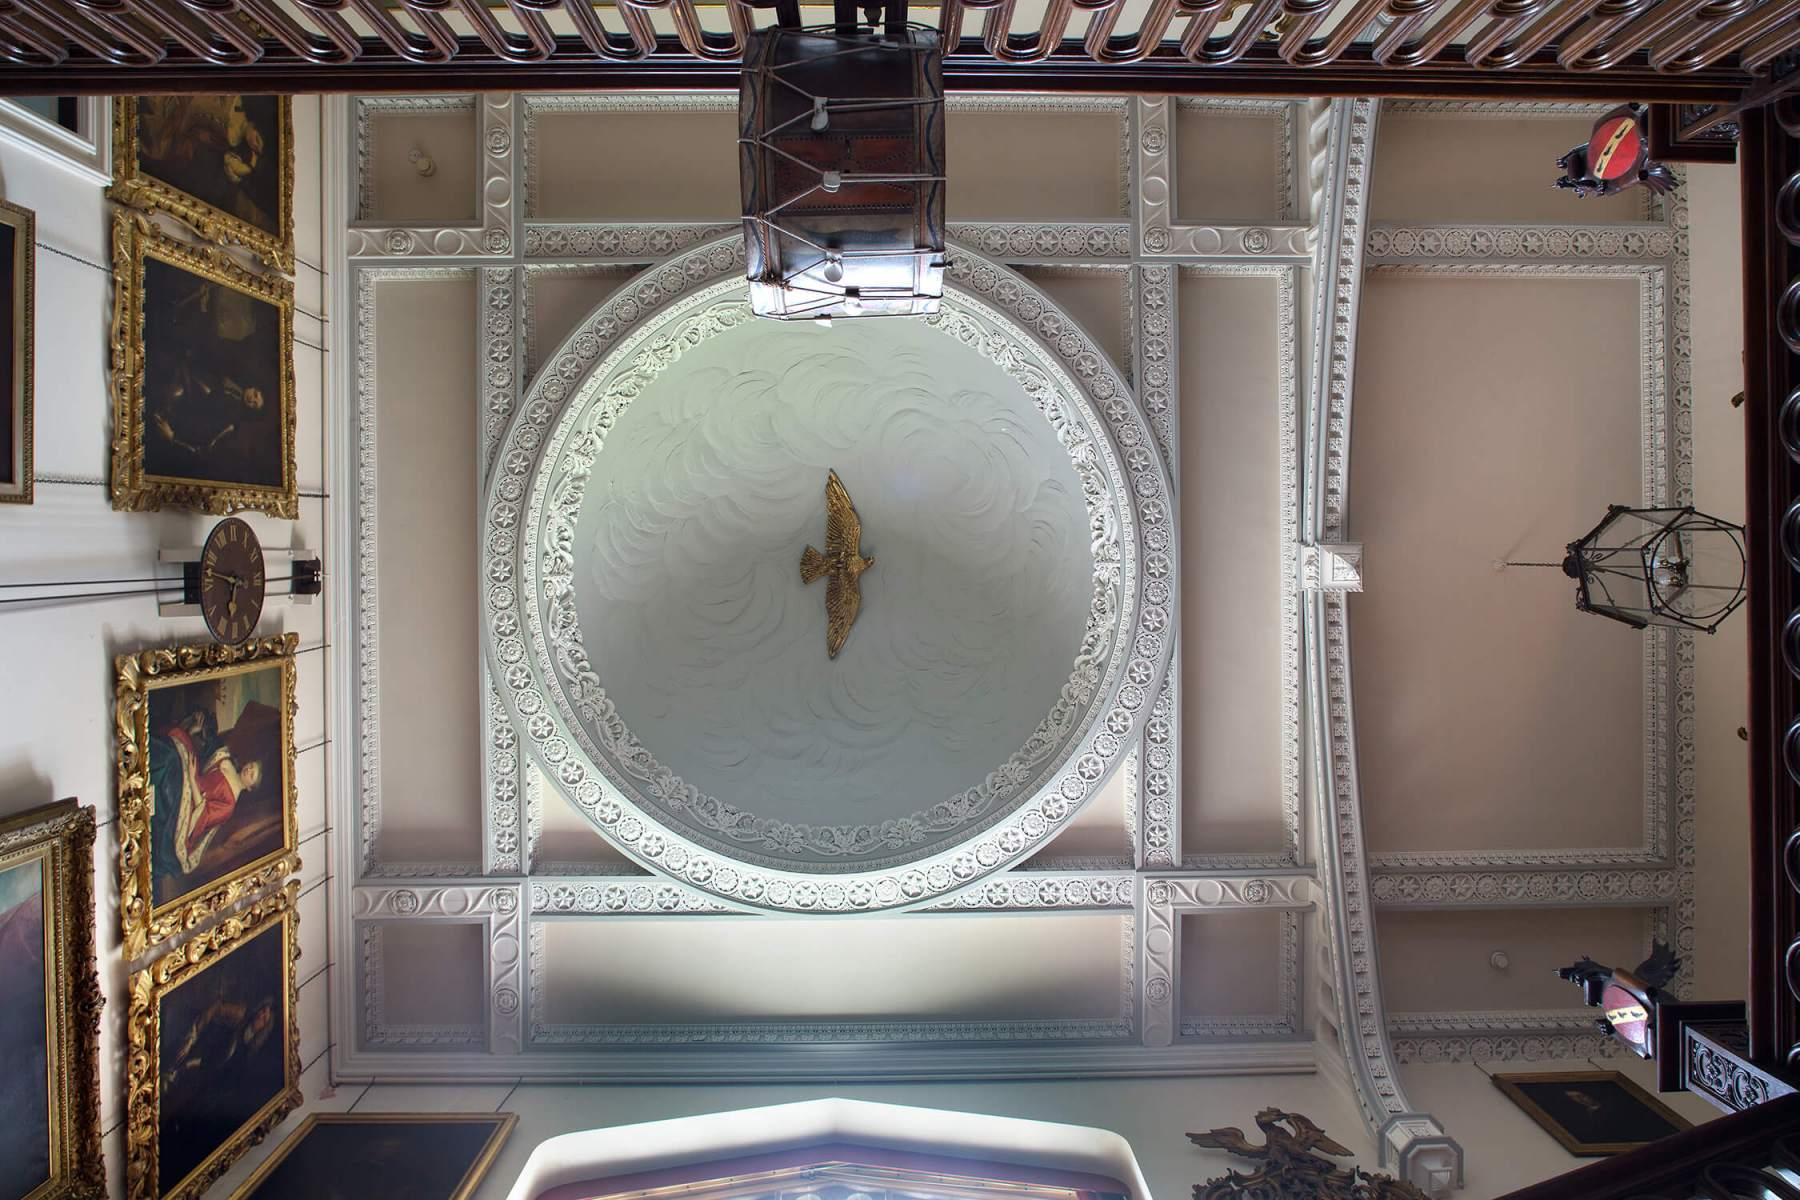 Interior Kilruddery-ornate-ceiling